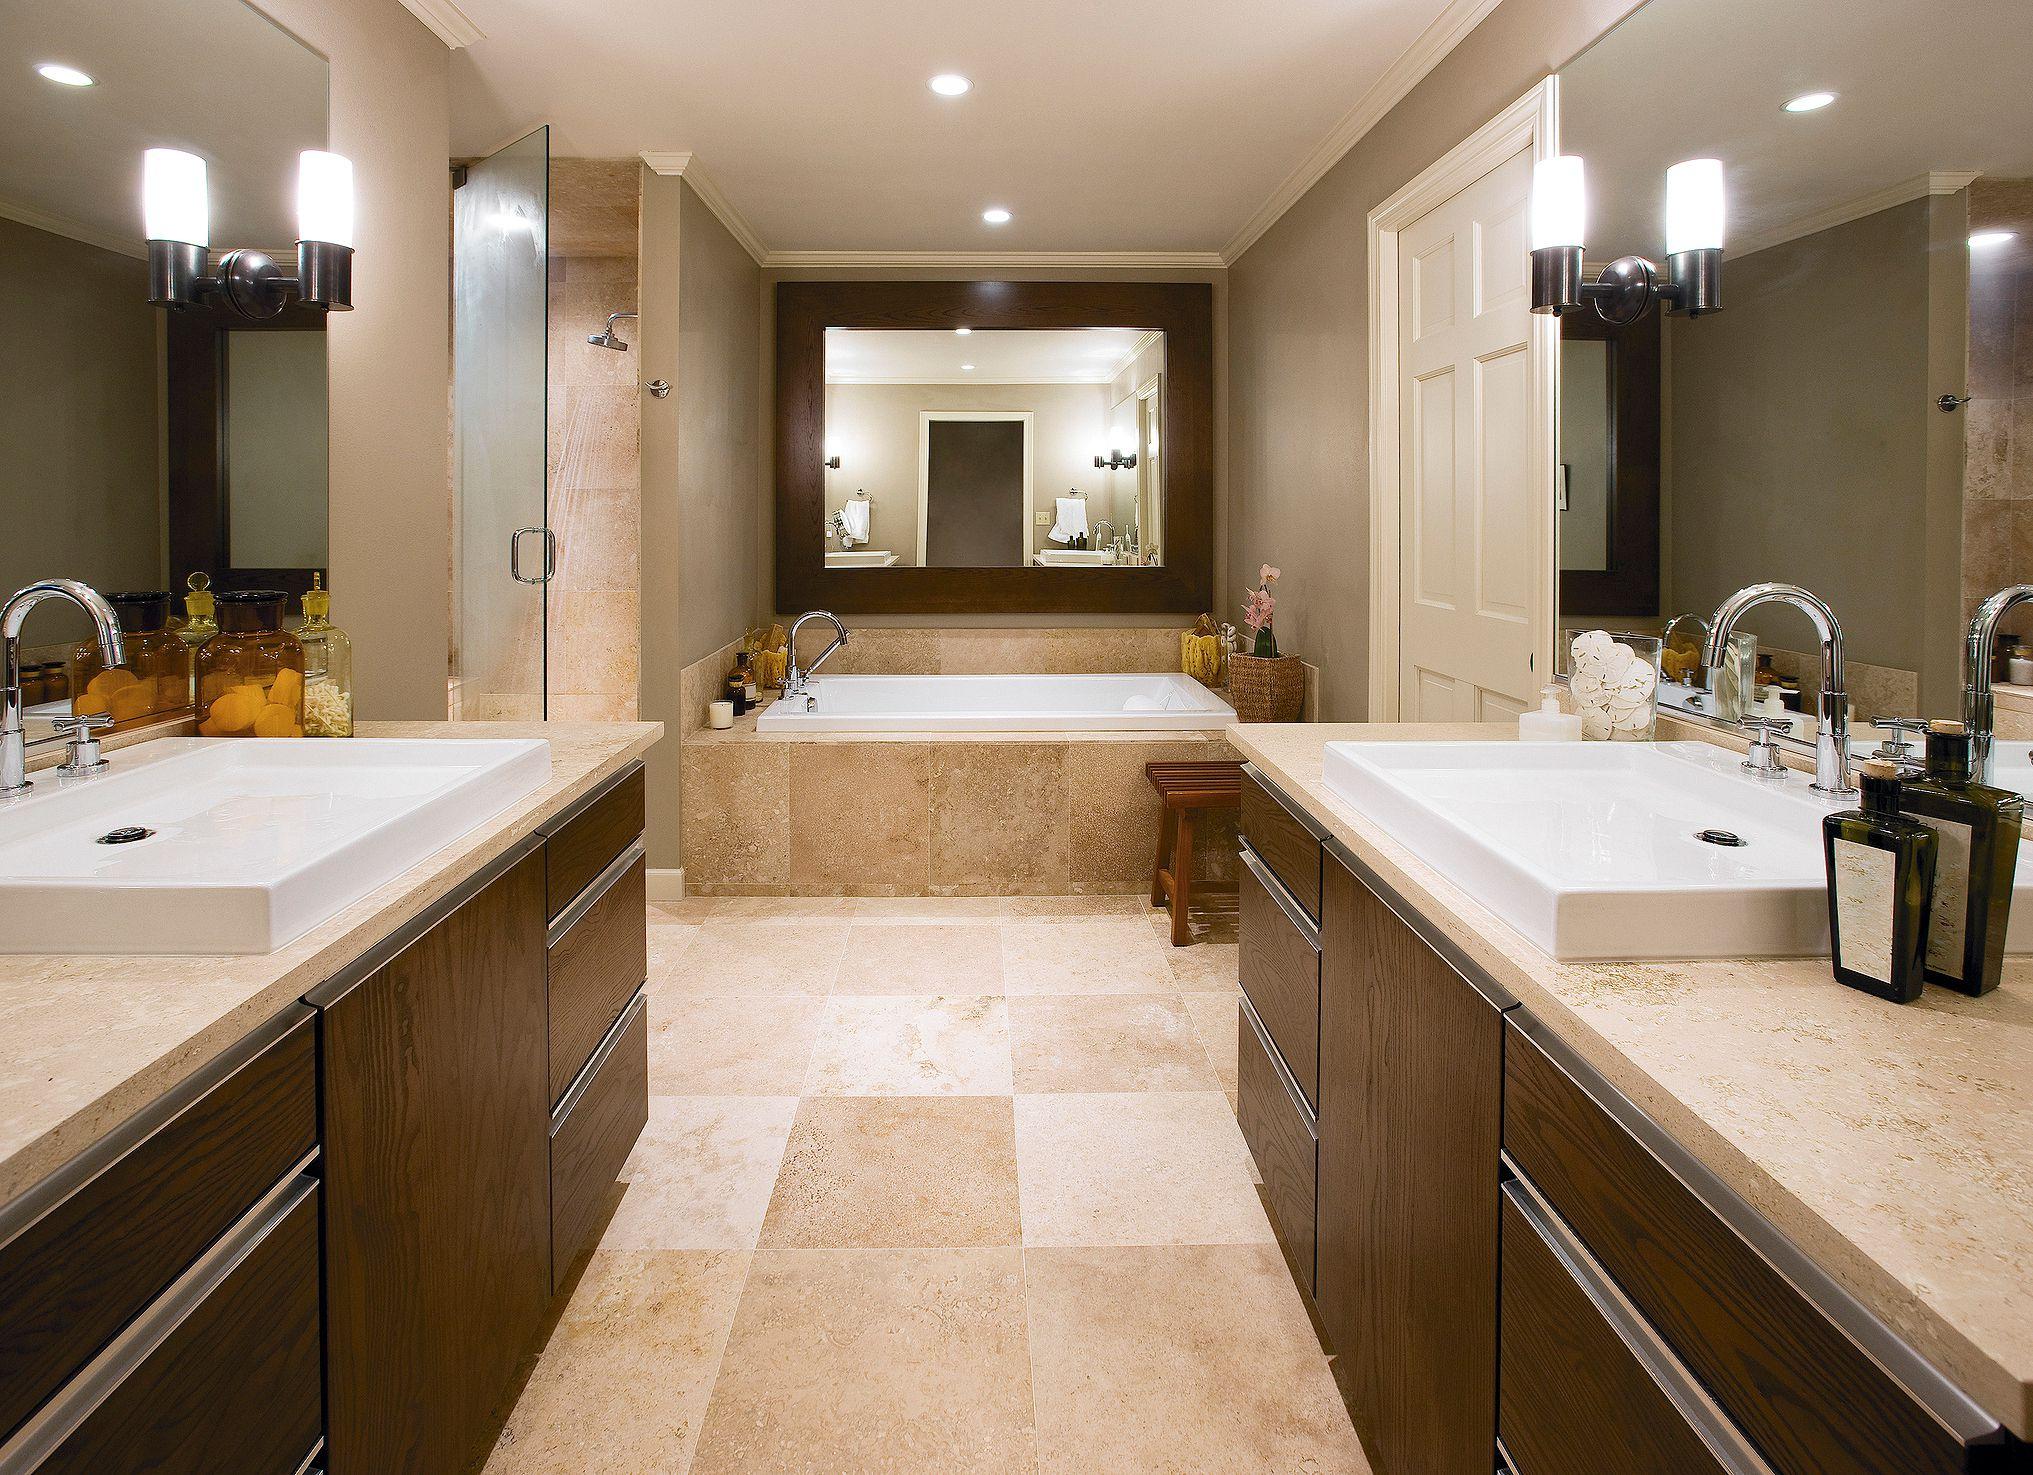 Top 5 Bathroom Flooring Options